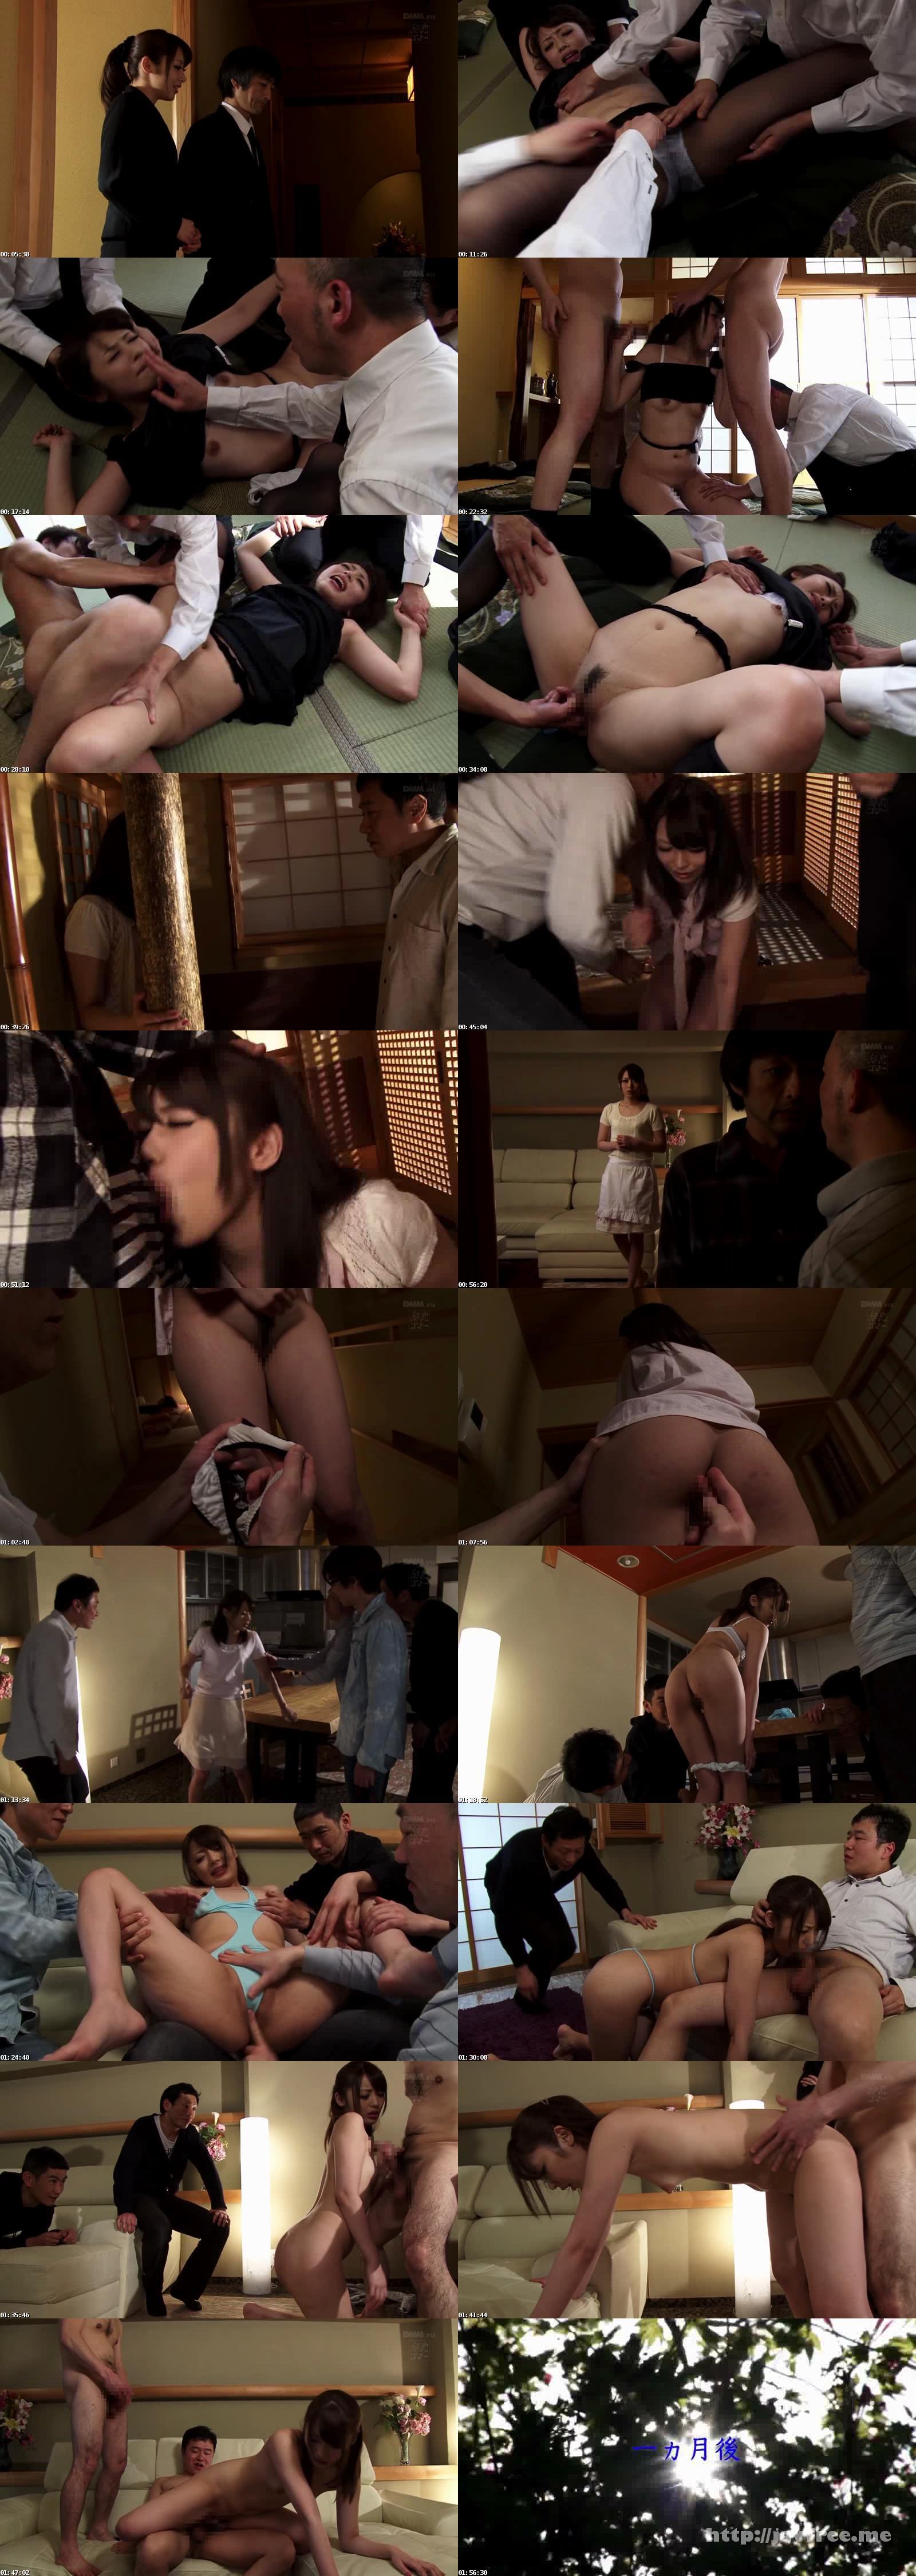 [MDYD 922] 夫の親族一同に輪姦された美人妻 桜井あゆ 桜井あゆ MDYD